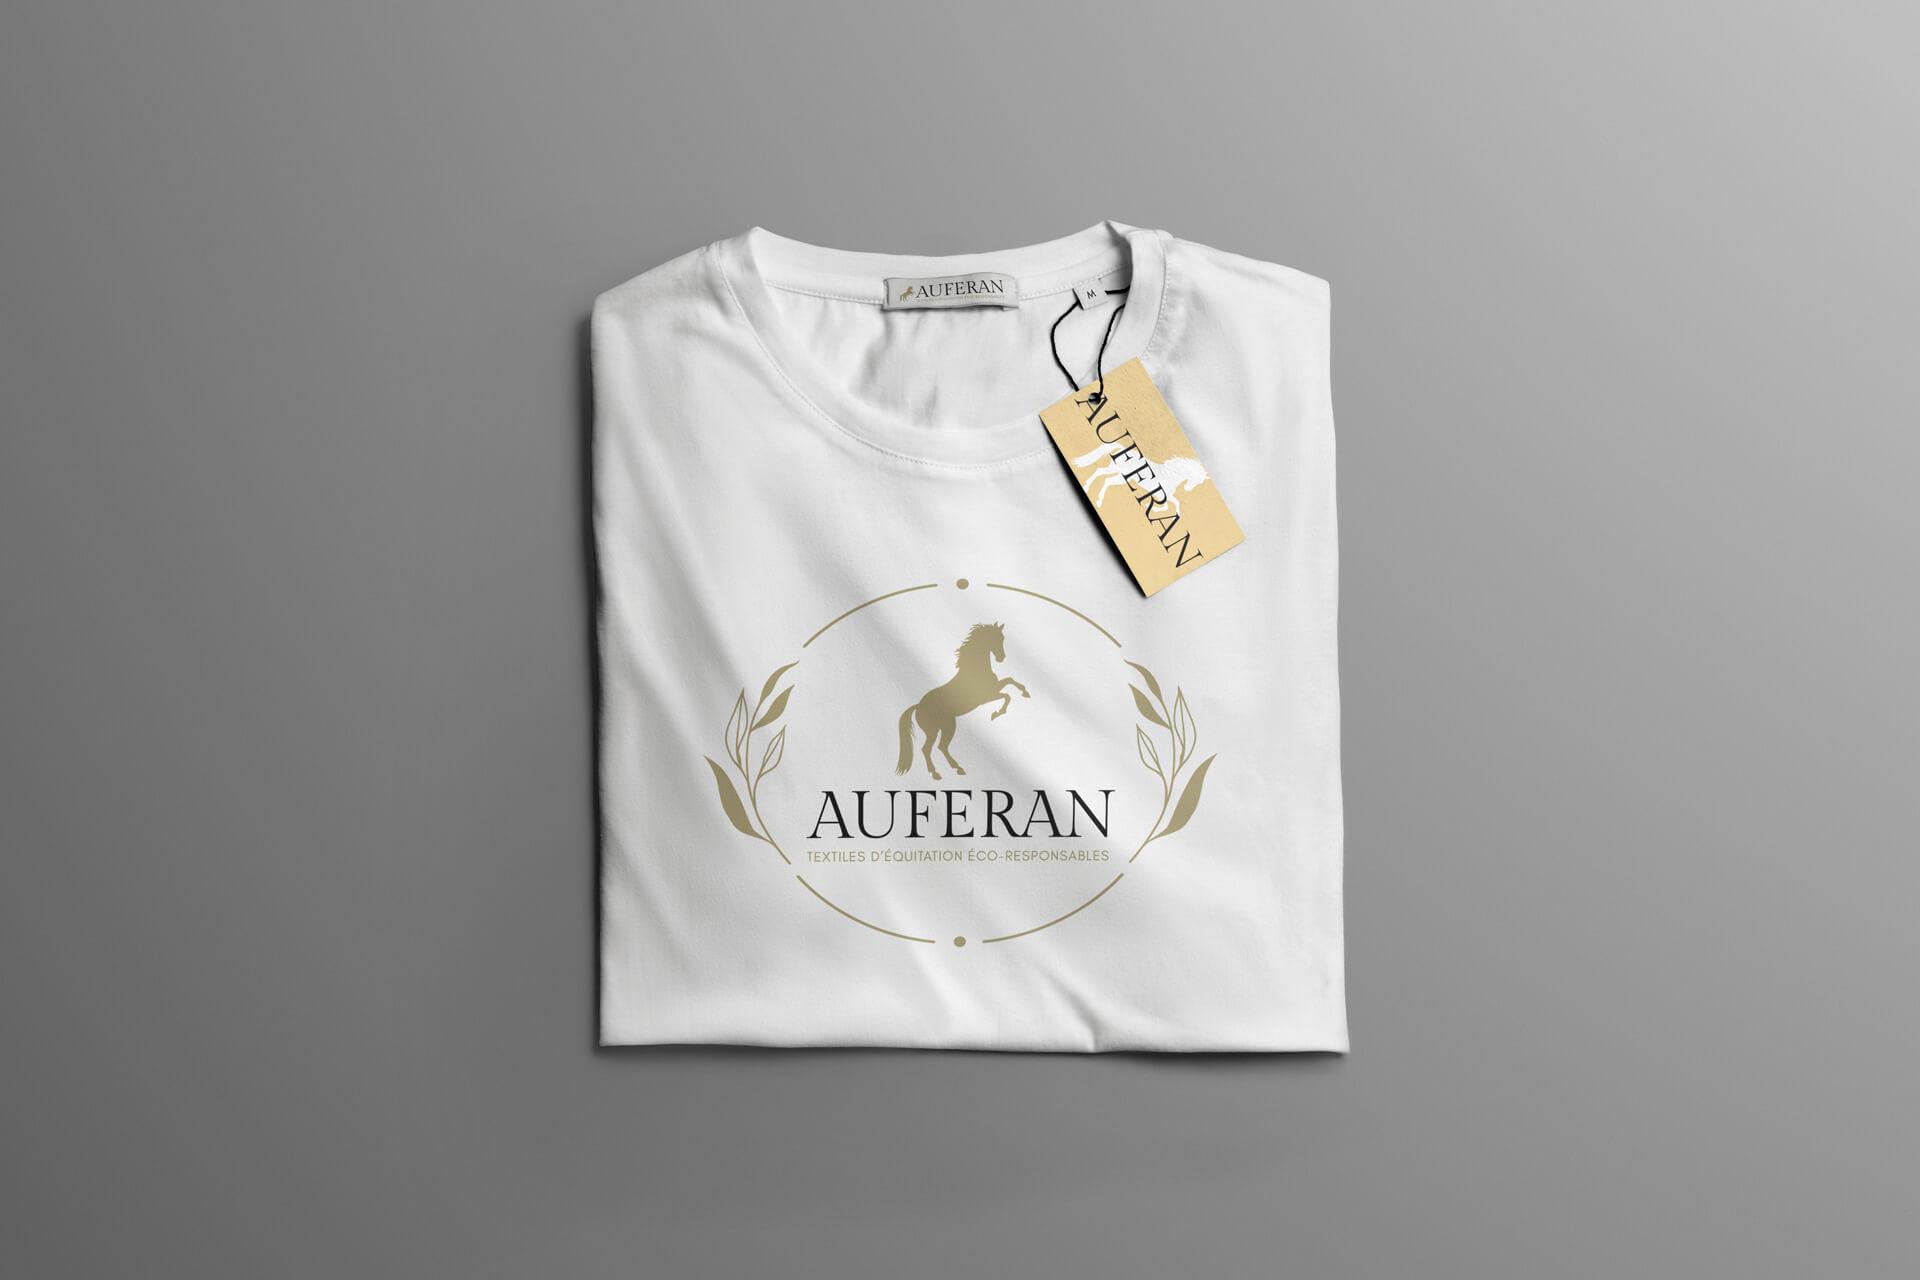 Tshirt pour auferan